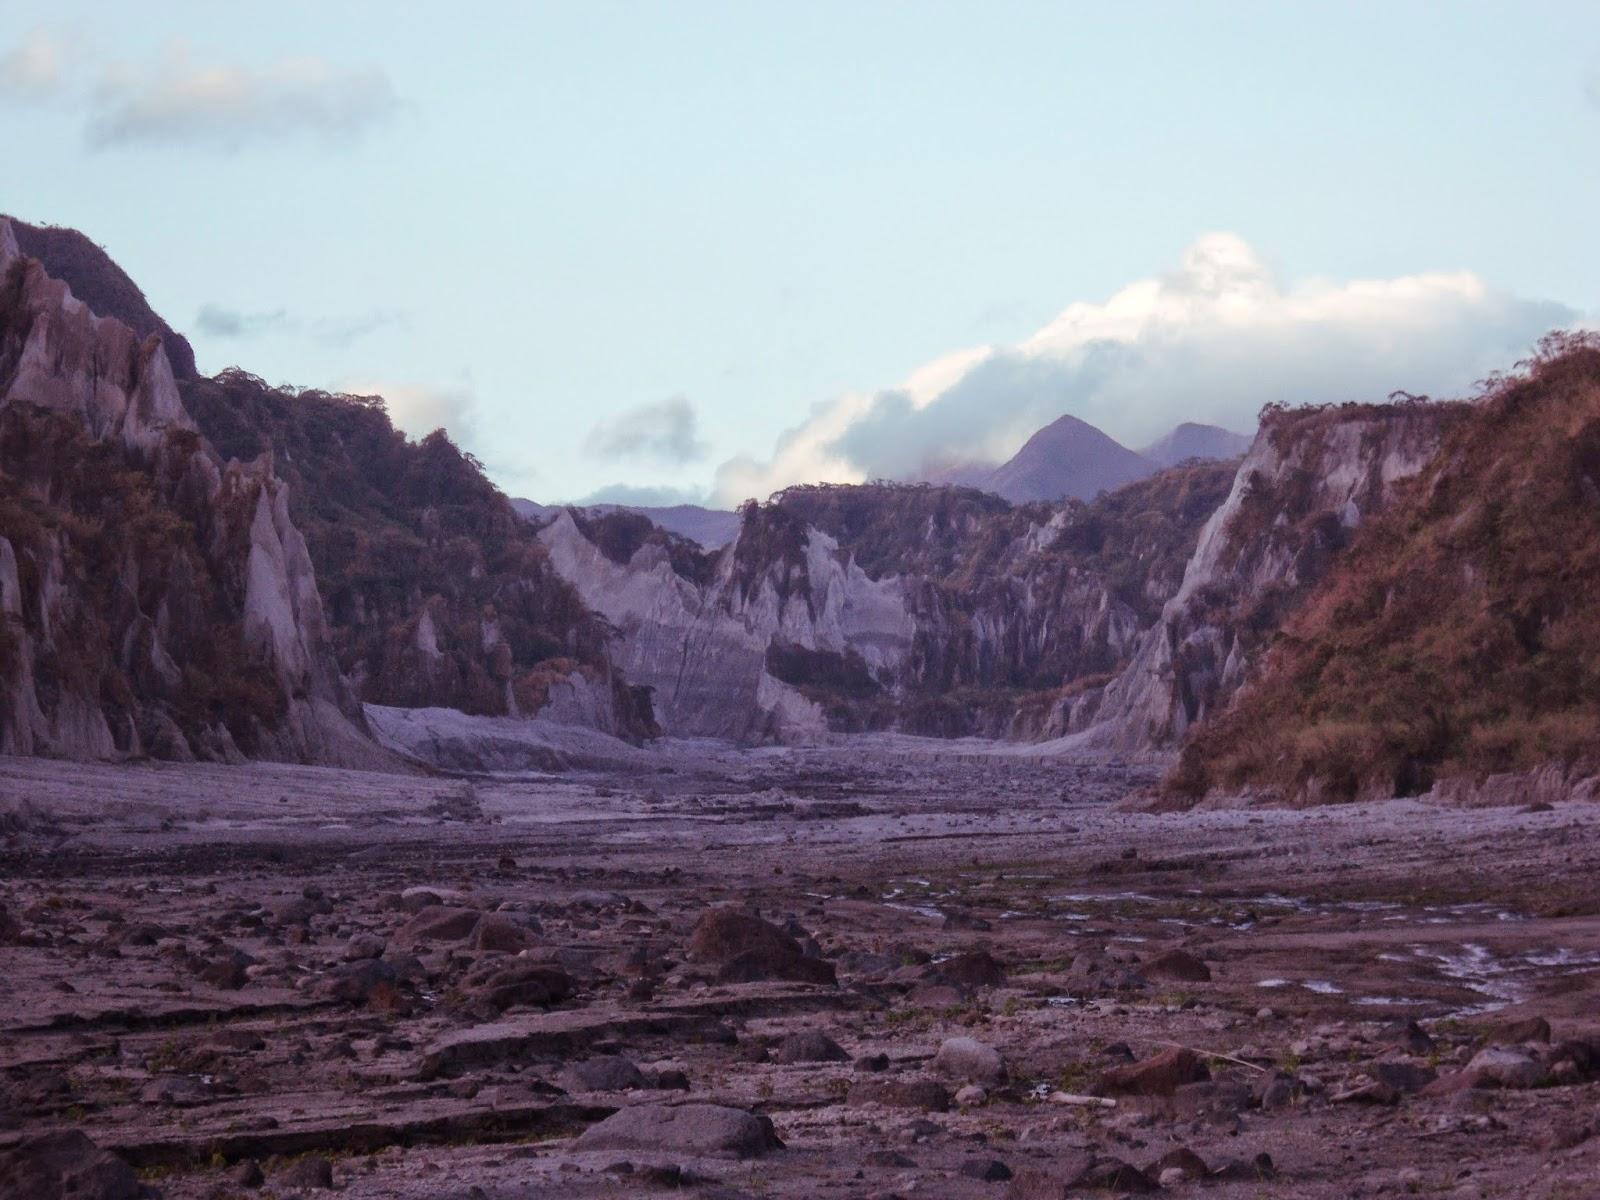 Mount Pinatubo trekking